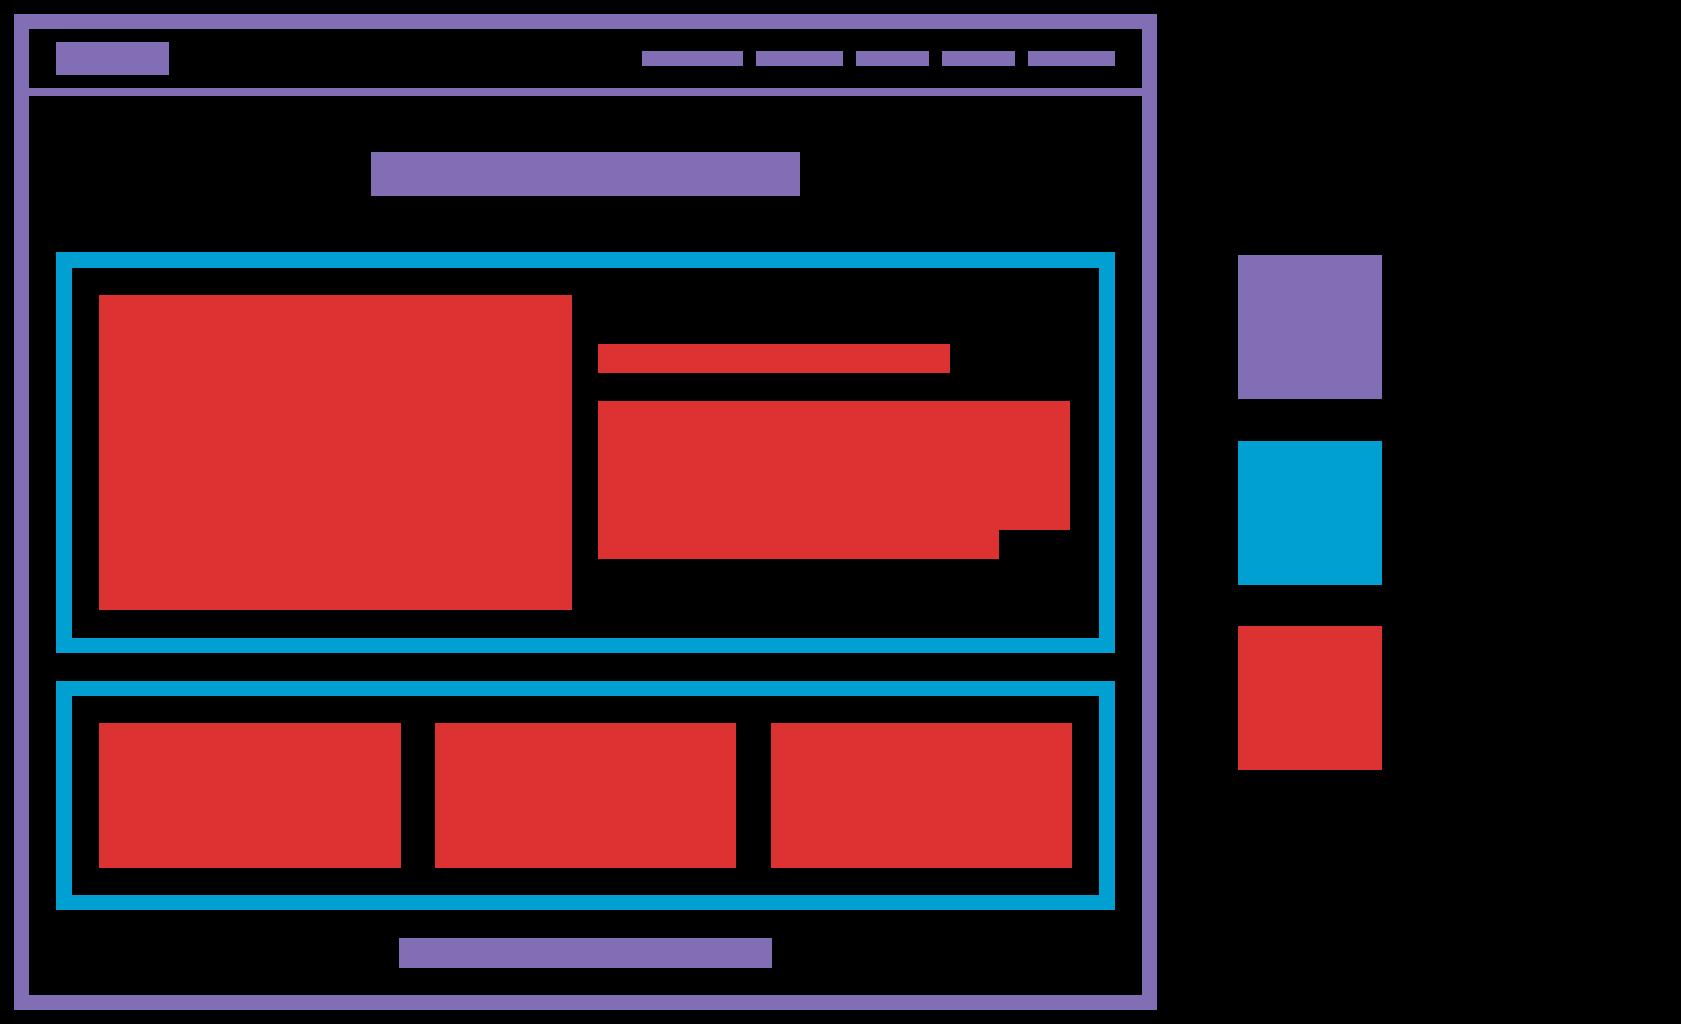 Blocks, Patterns, and Layouts